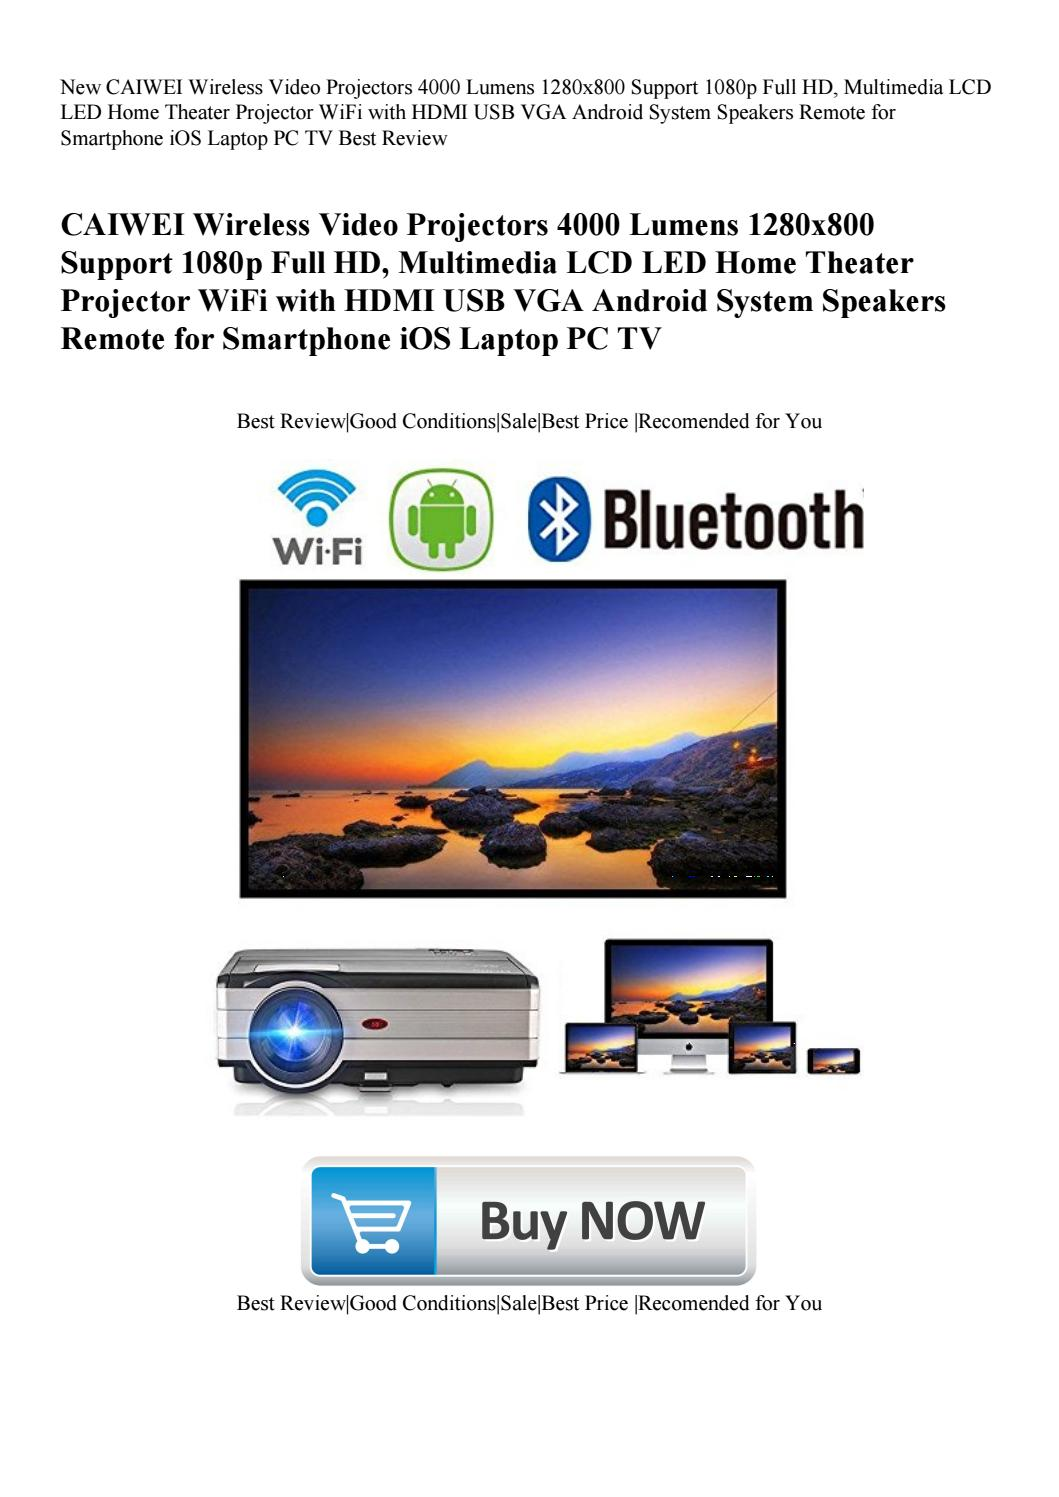 New CAIWEI Wireless Video Projectors 4000 Lumens 1280x800